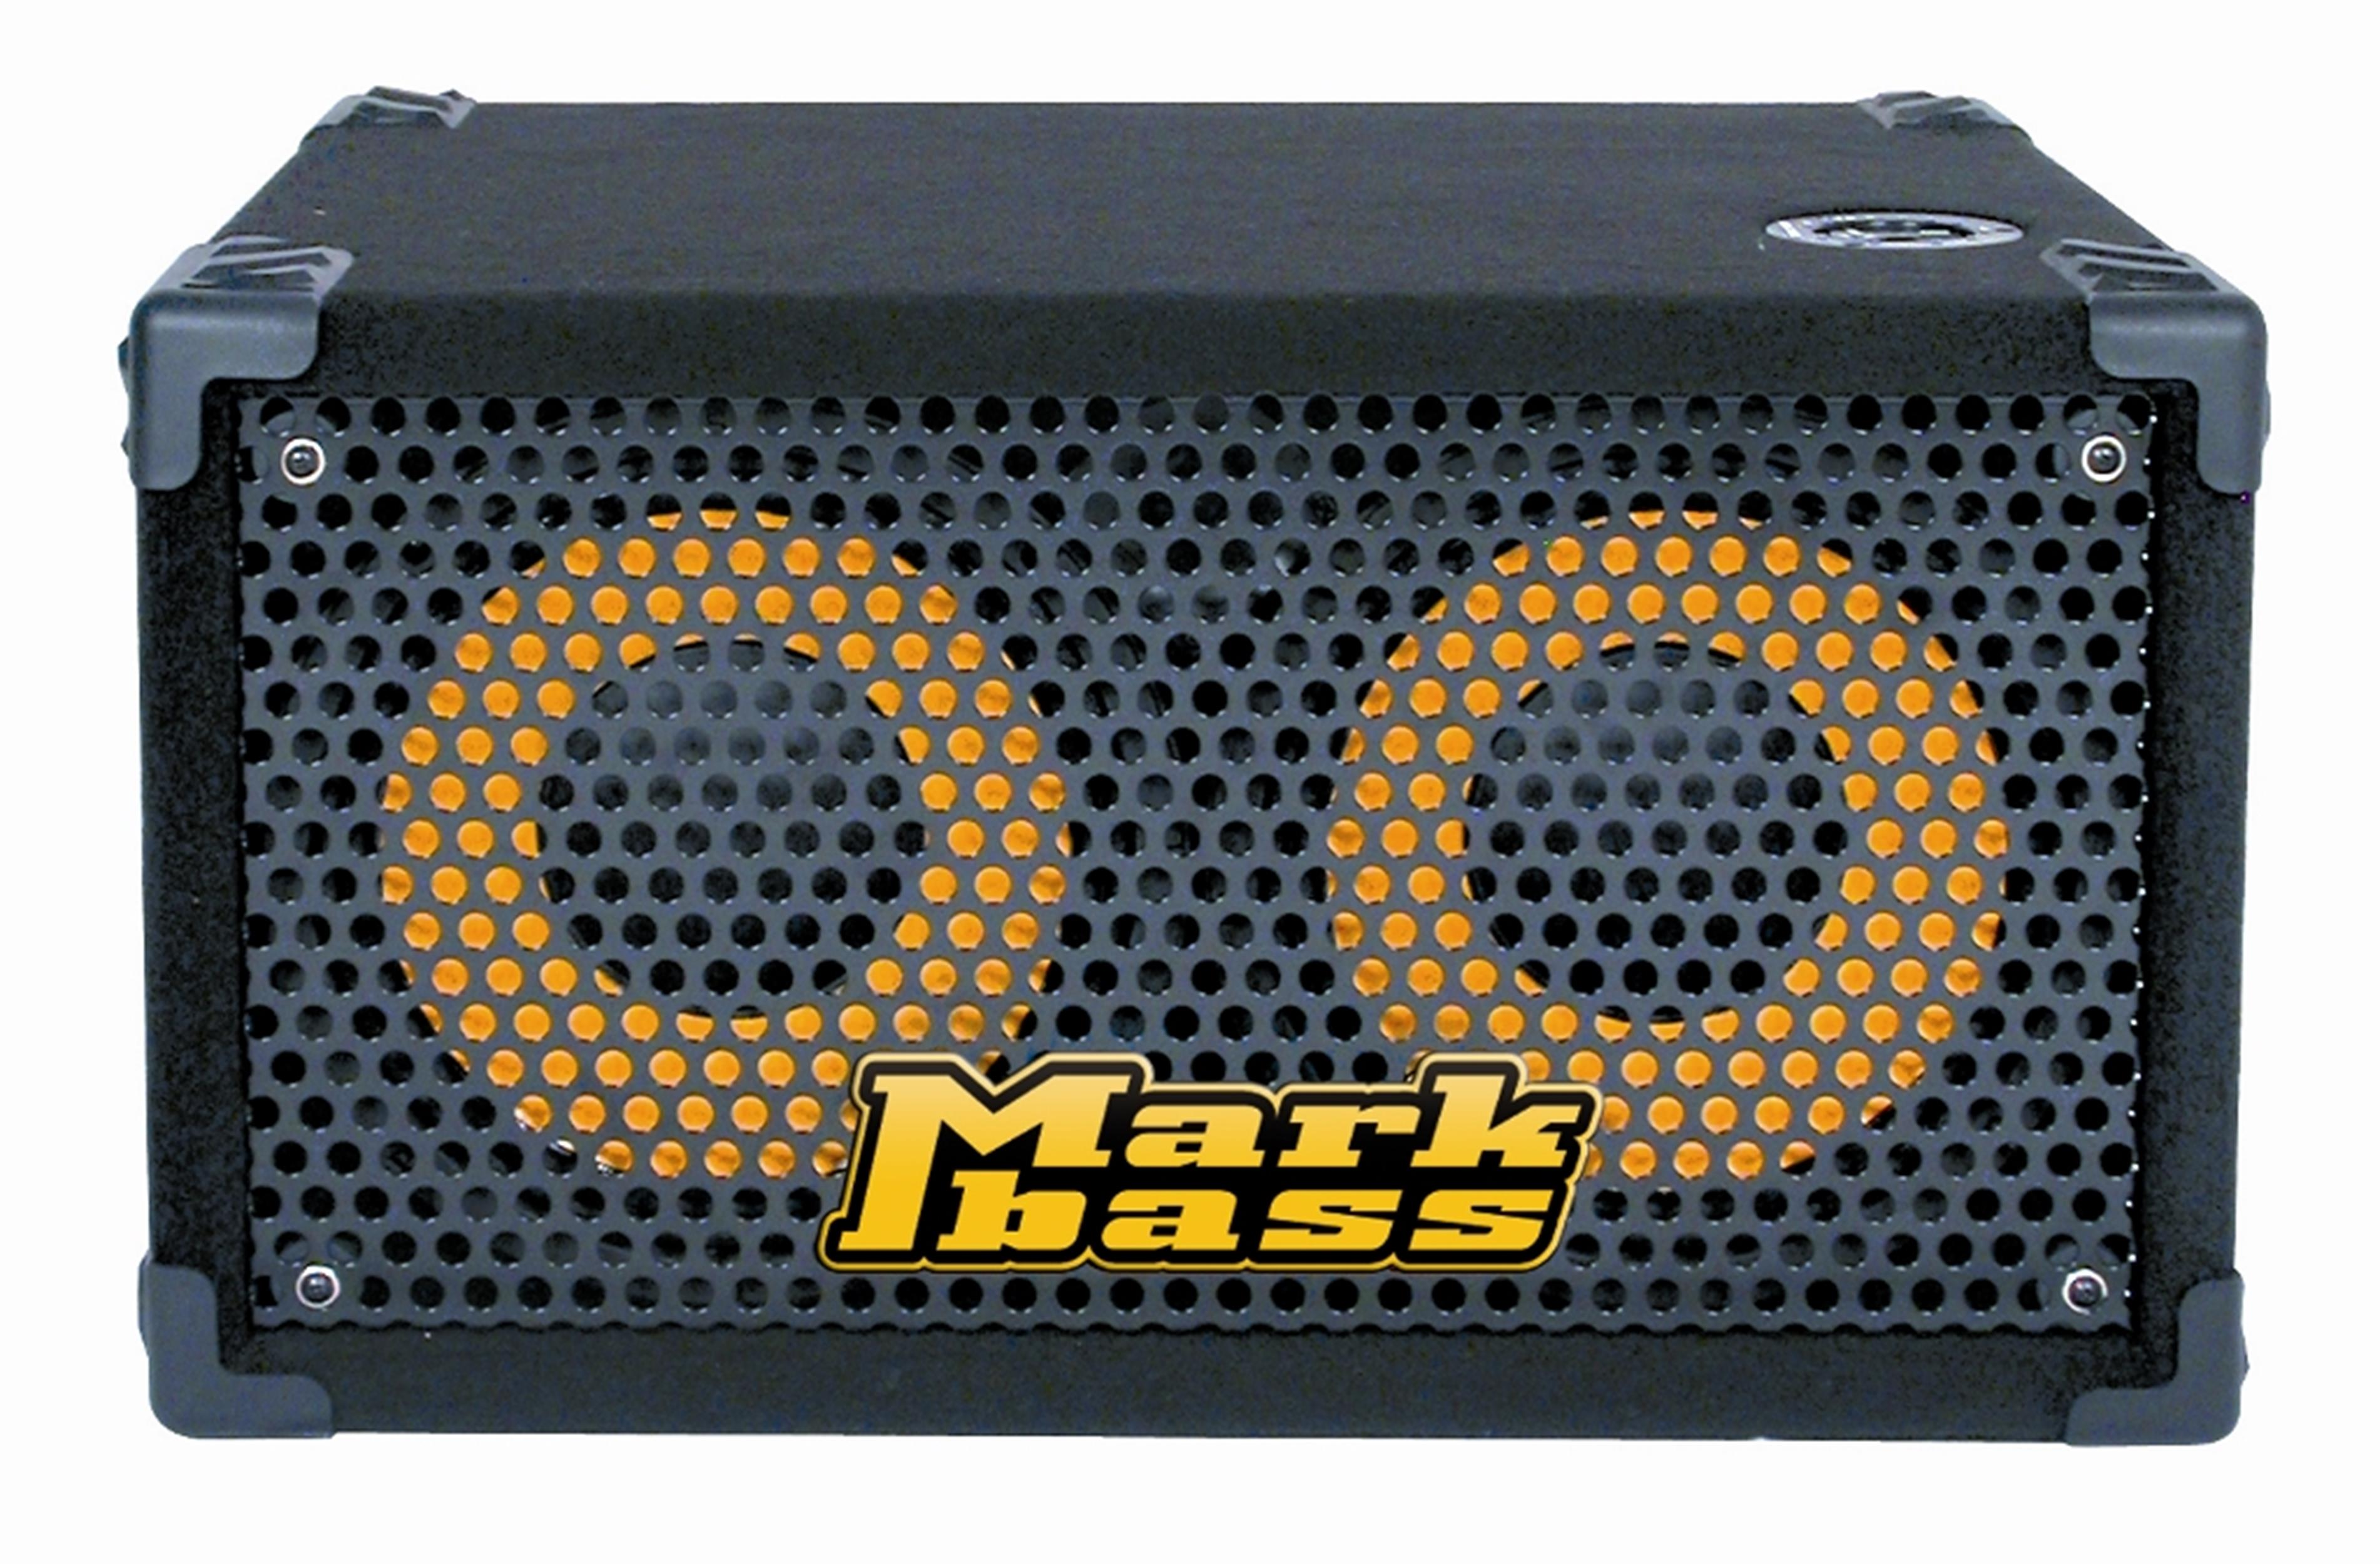 MARKBASS TRAVELER 102 P 8 OHM - Bassi Amplificatori - Casse